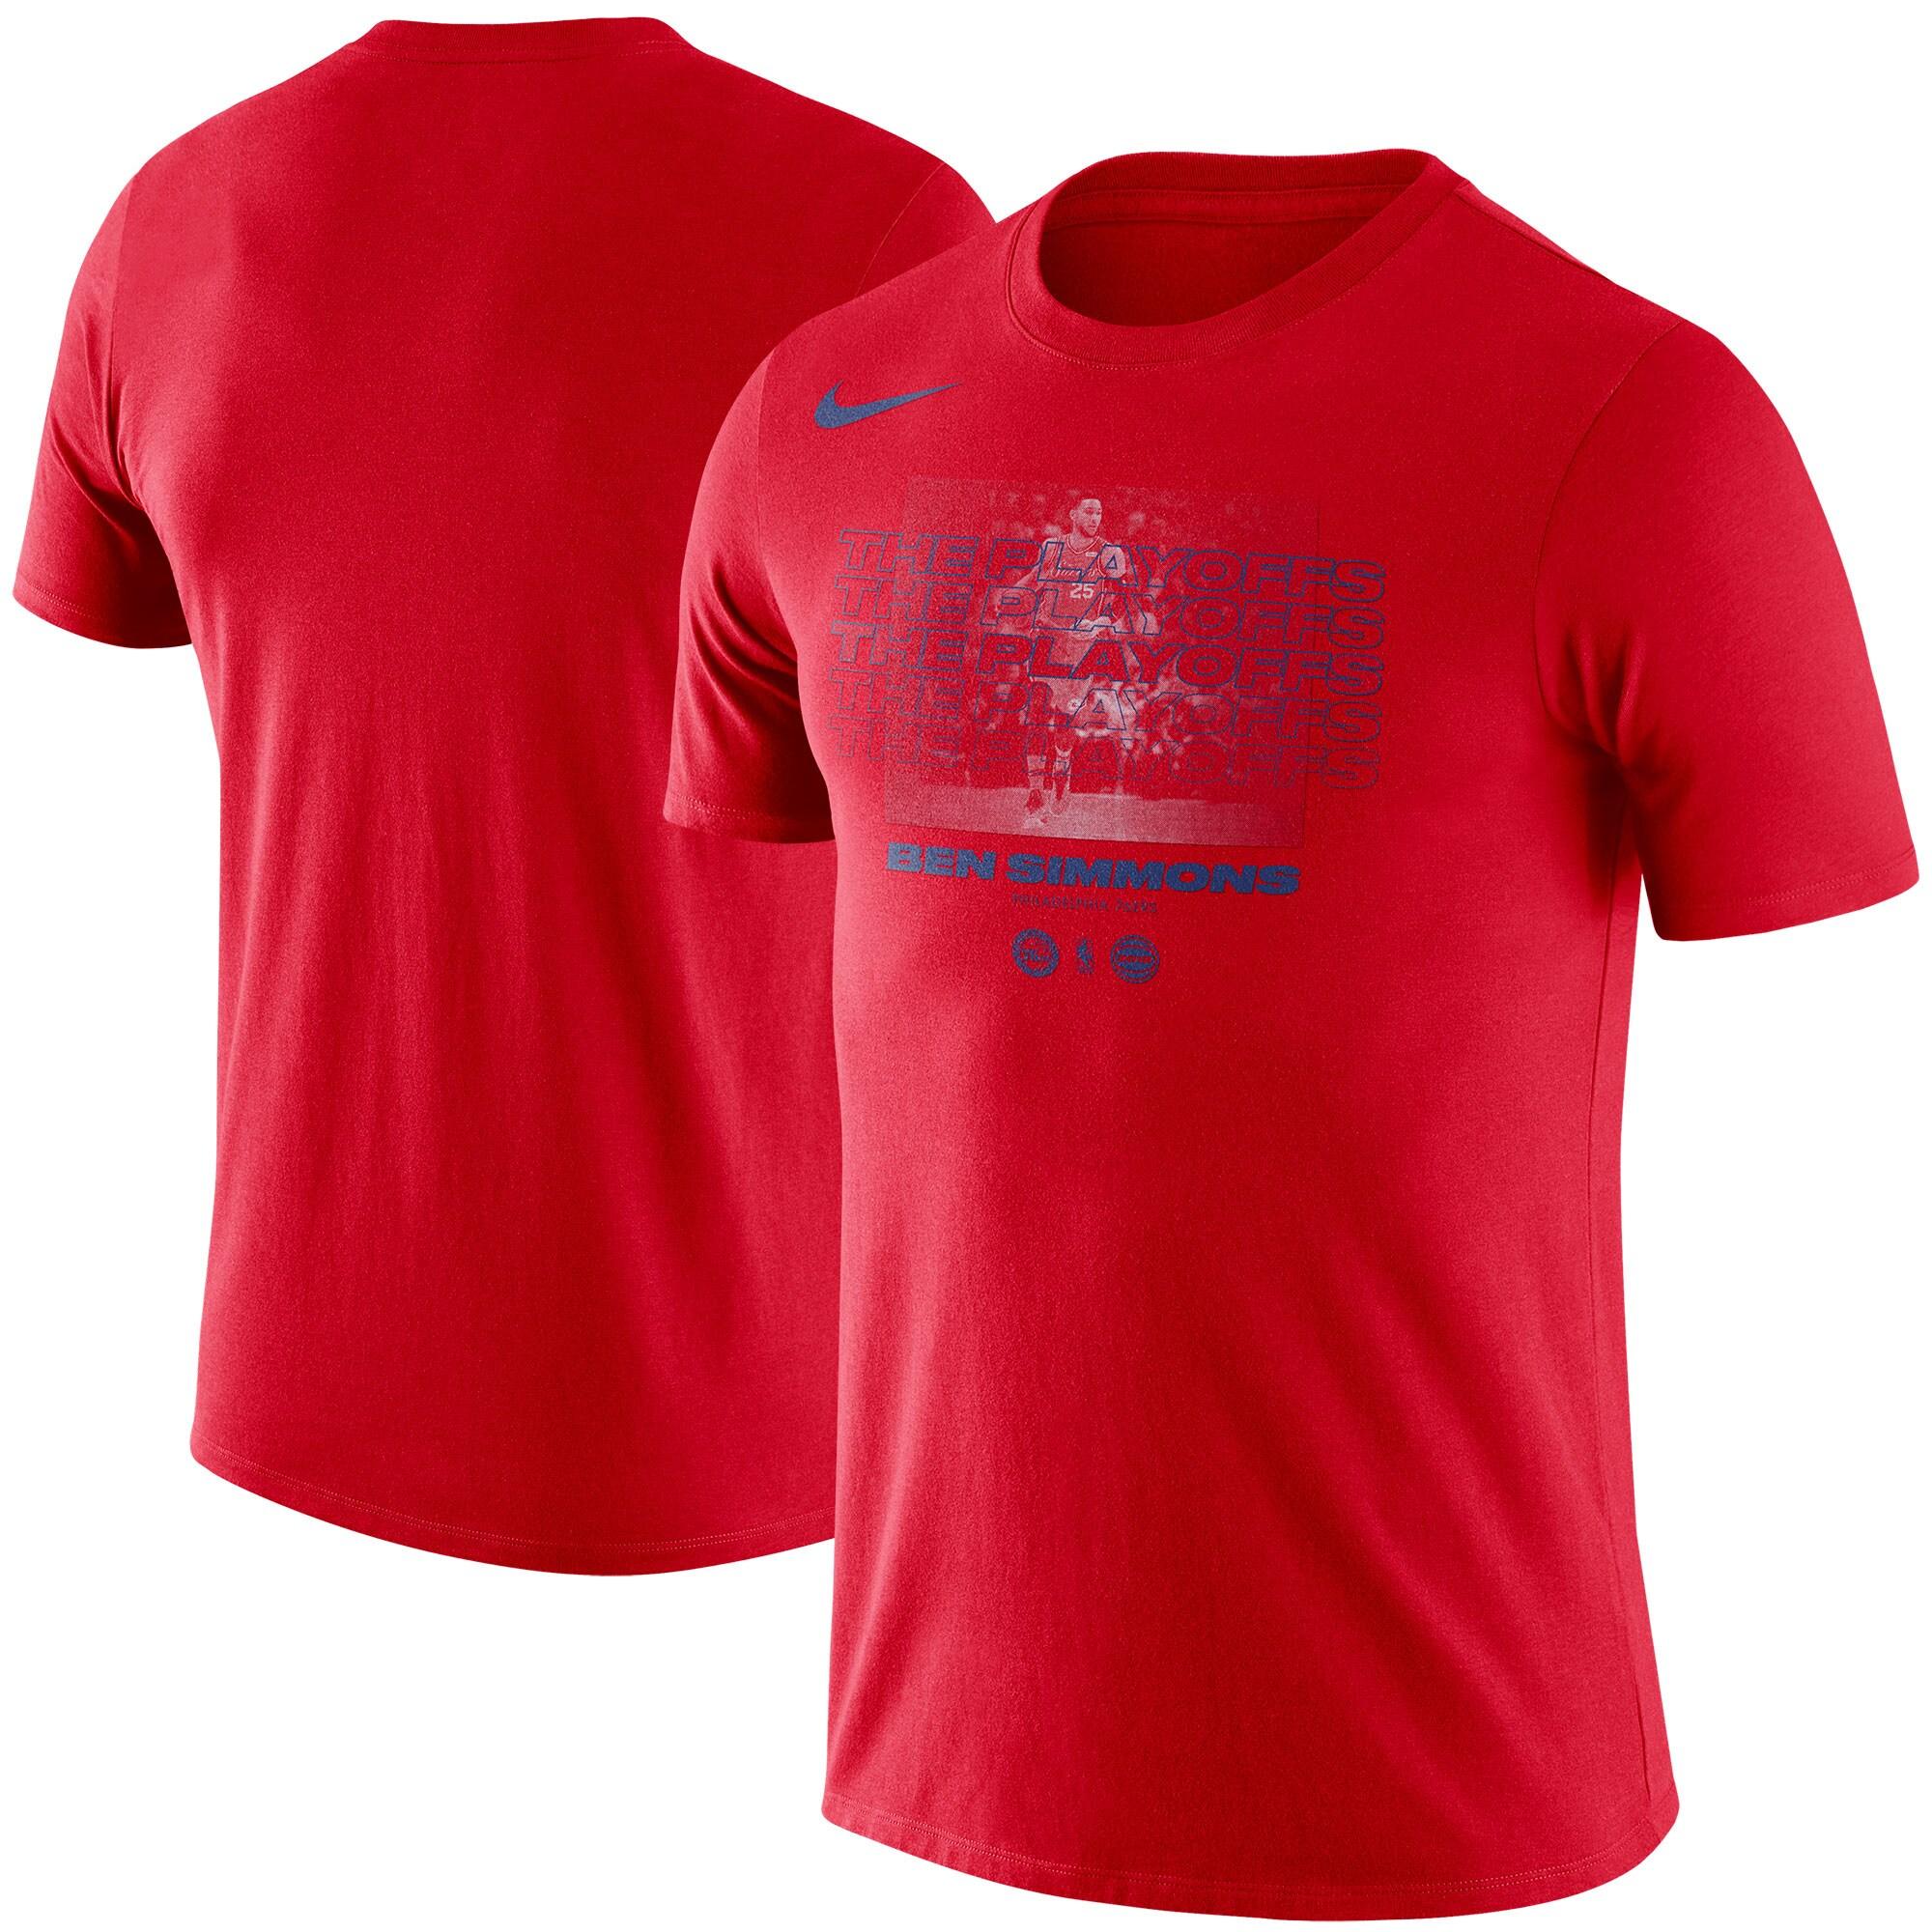 Ben Simmons Philadelphia 76ers Nike 2018 NBA Playoffs Name & Number T-Shirt - Red